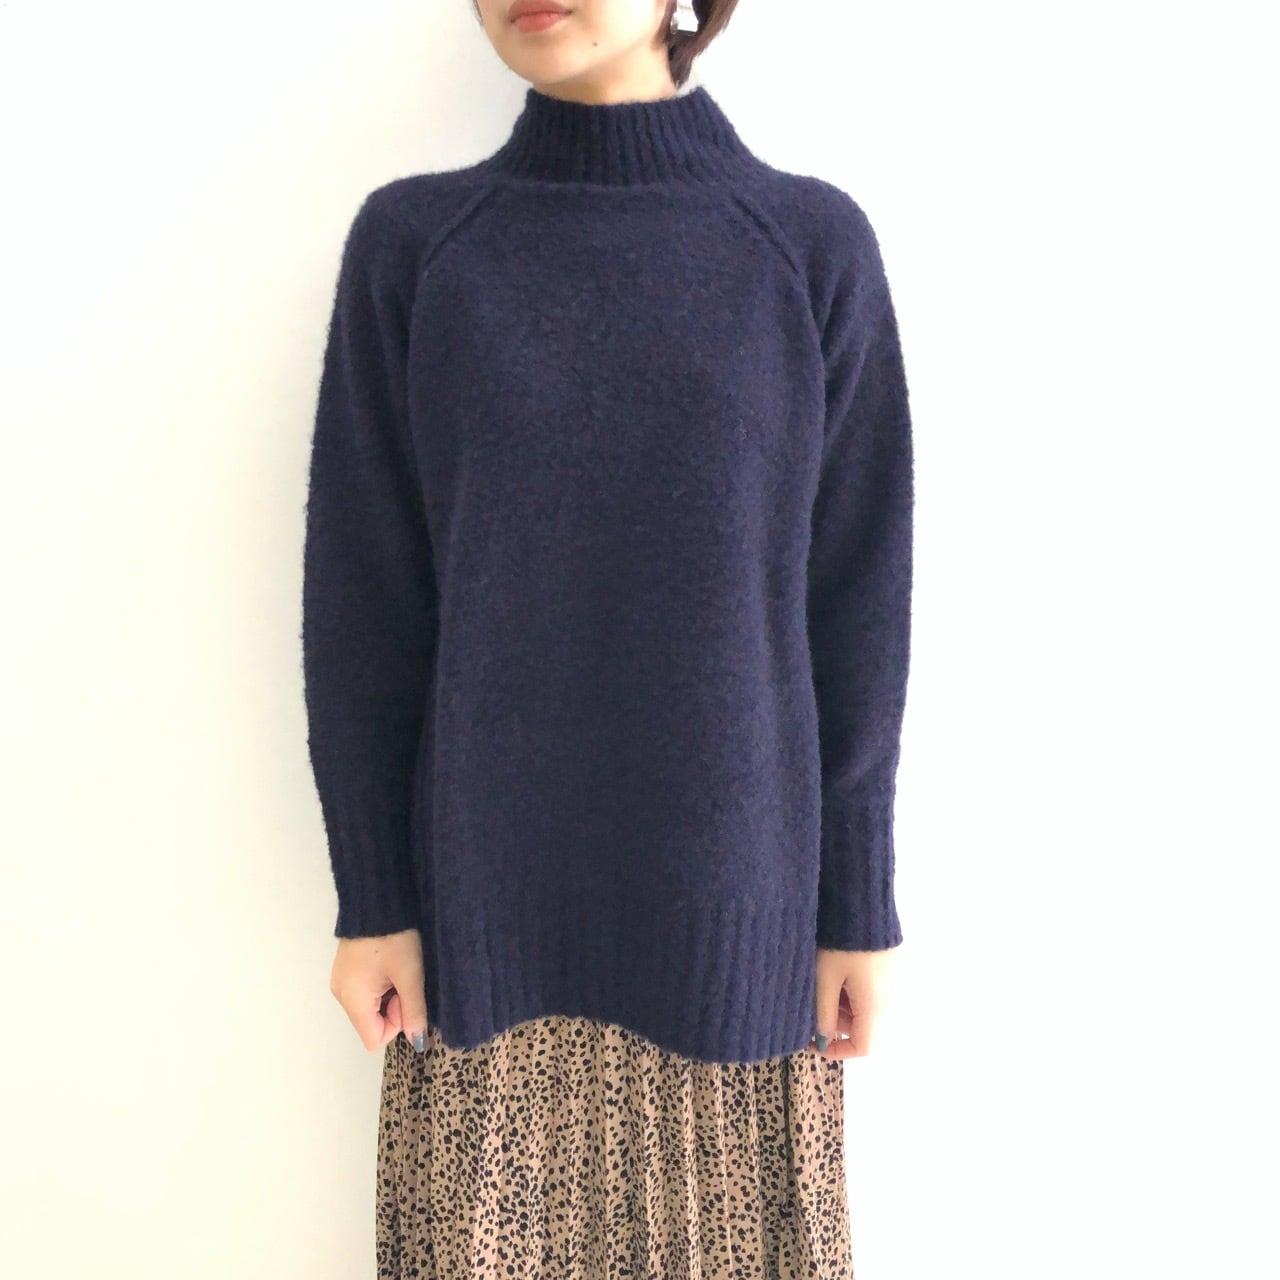 【 QTUME 】- 952-25505 - アルパカニット